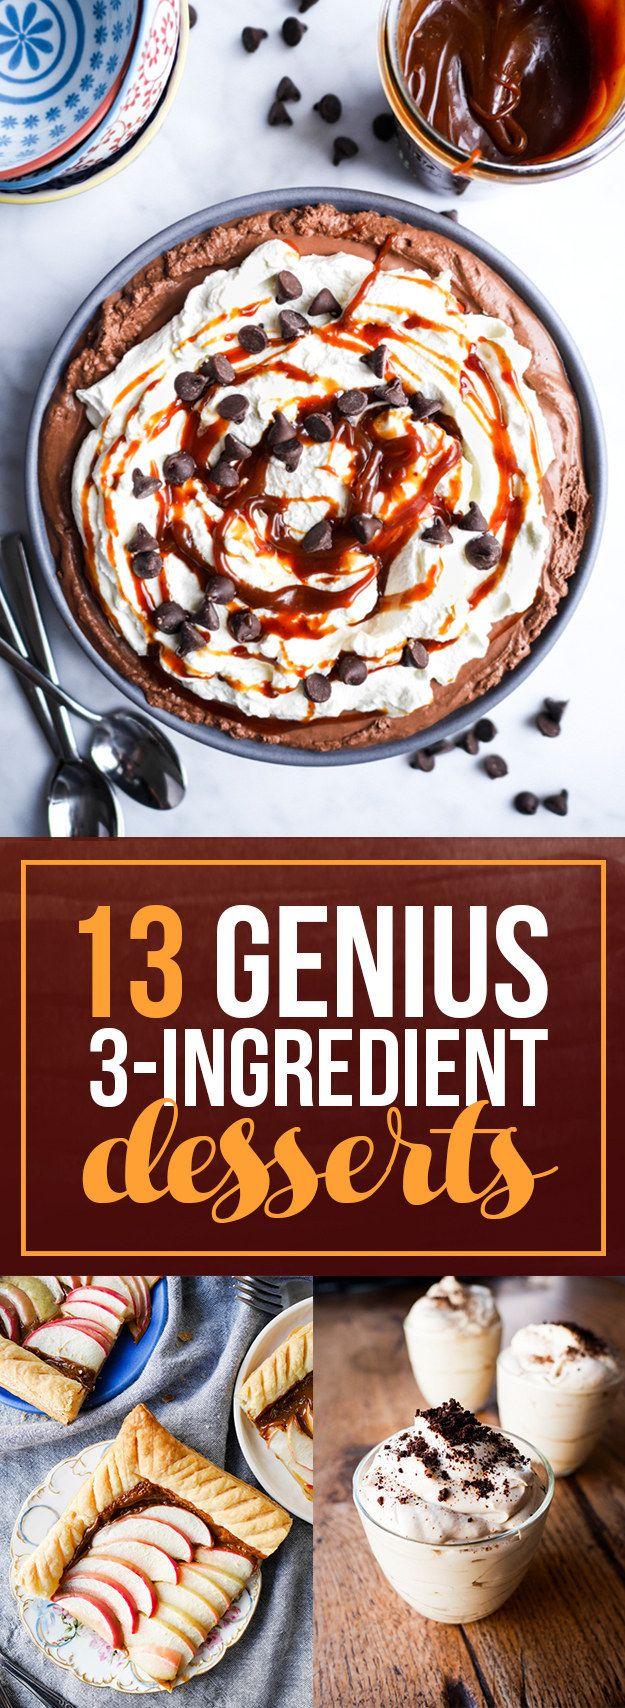 Desserts i could make | 13 Genius Three-Ingredient Desserts To Make For Thanksgiving